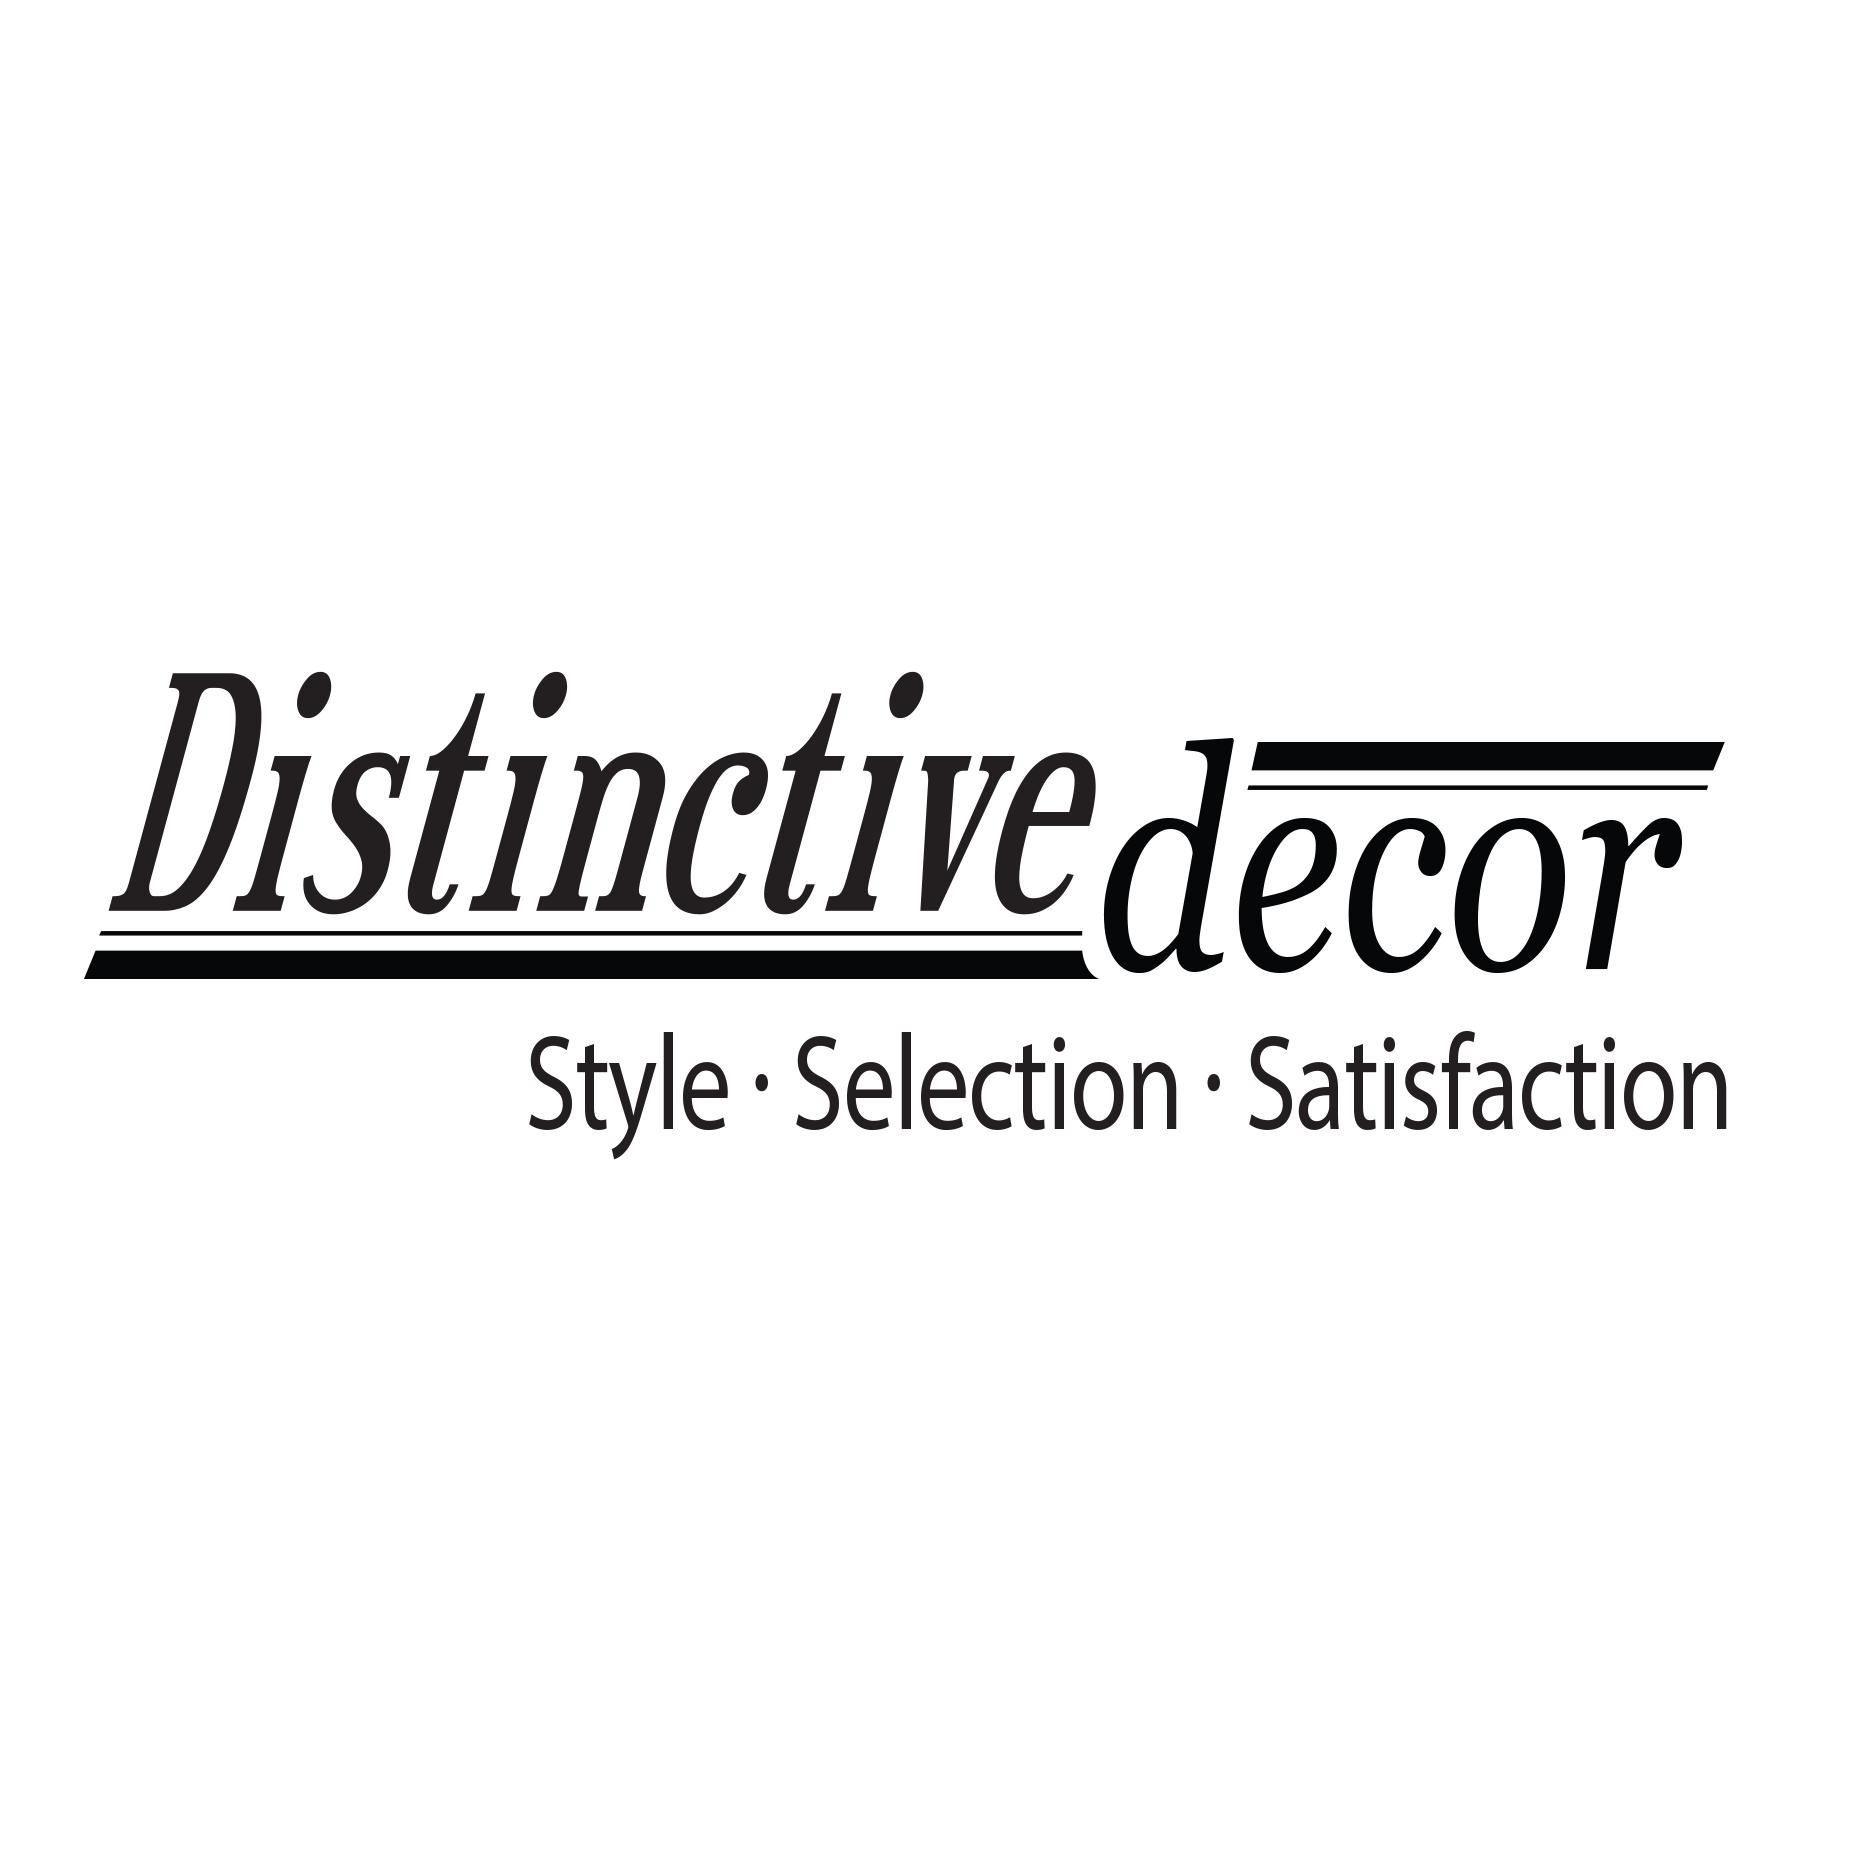 Distinctive Decor Inc.